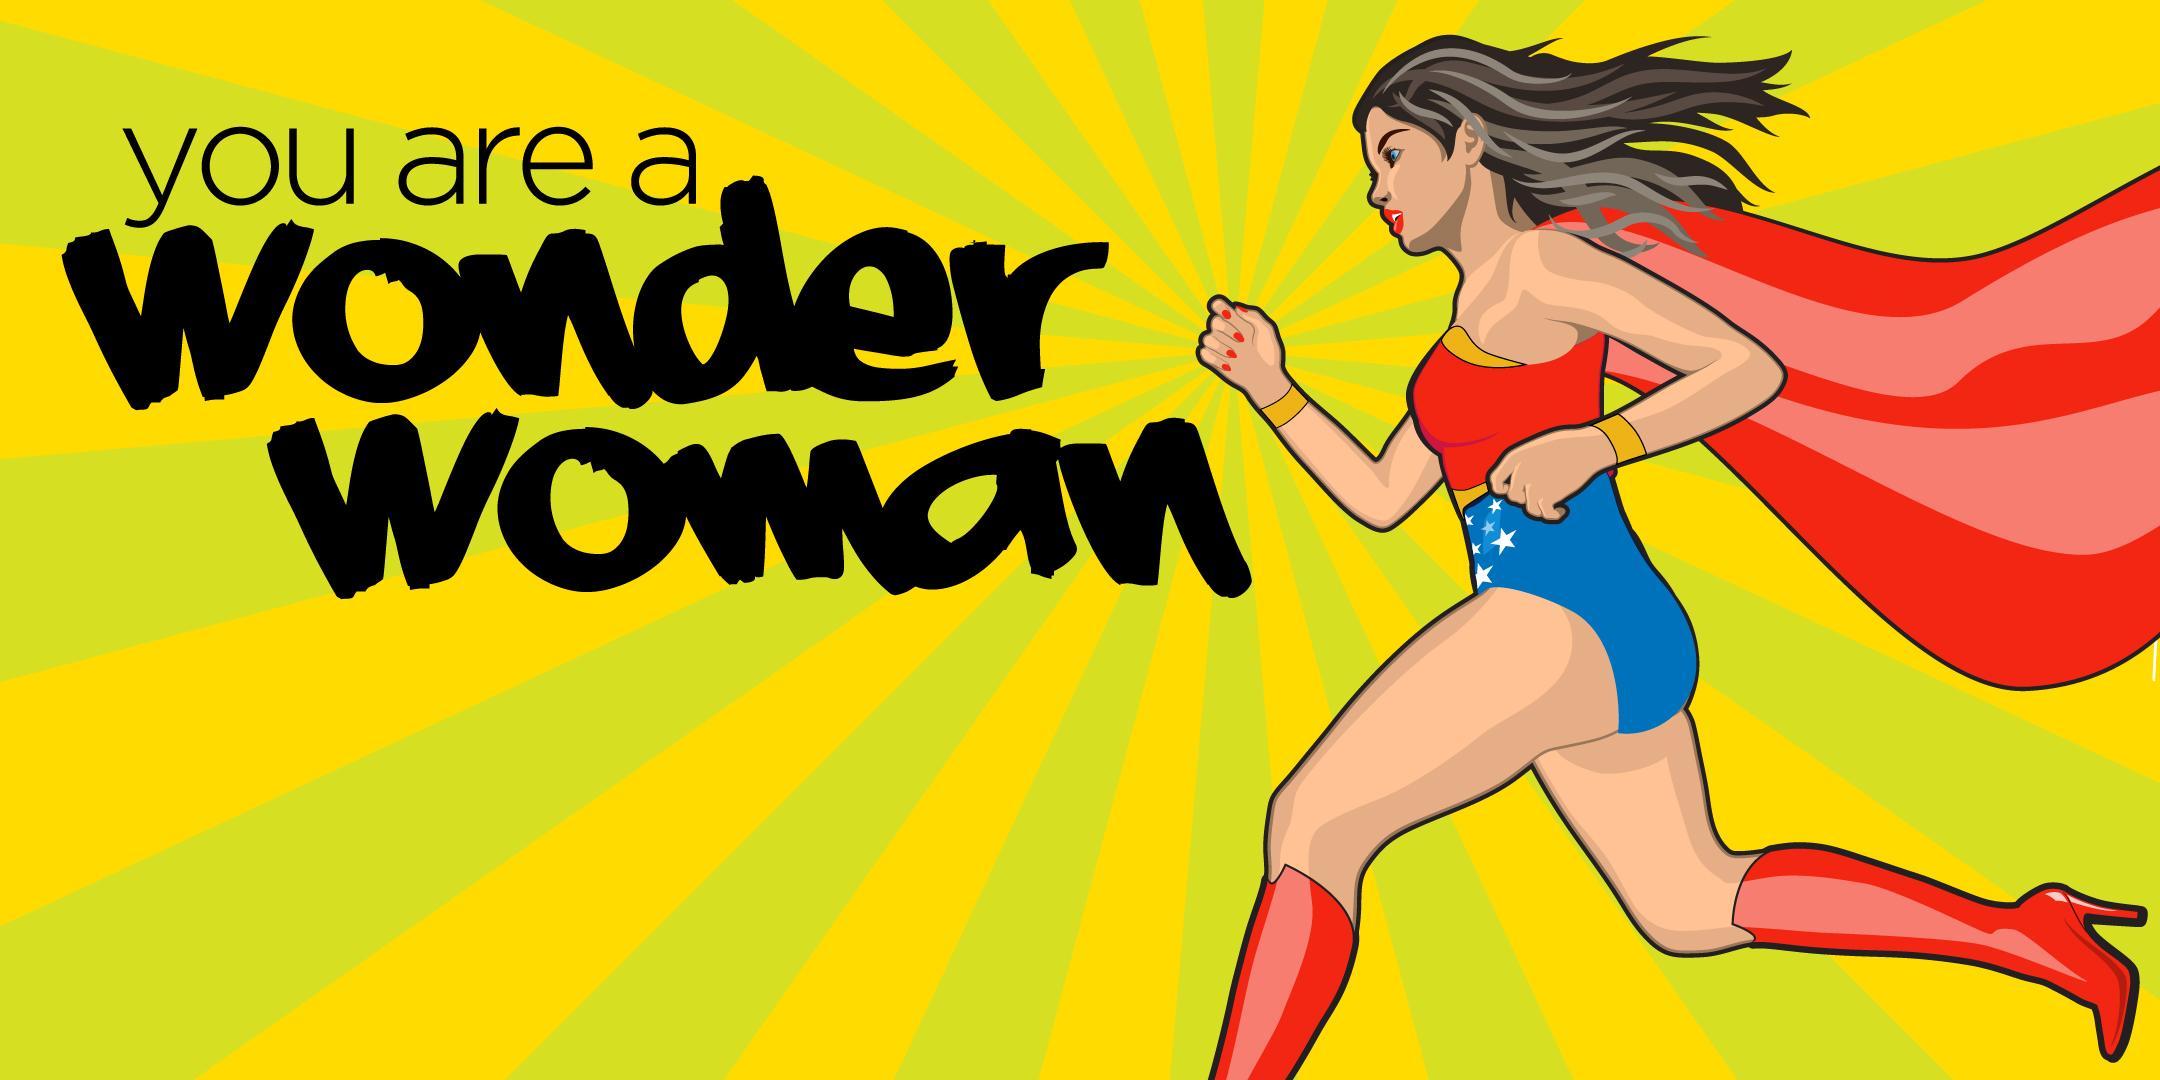 Calling all Wonder Women